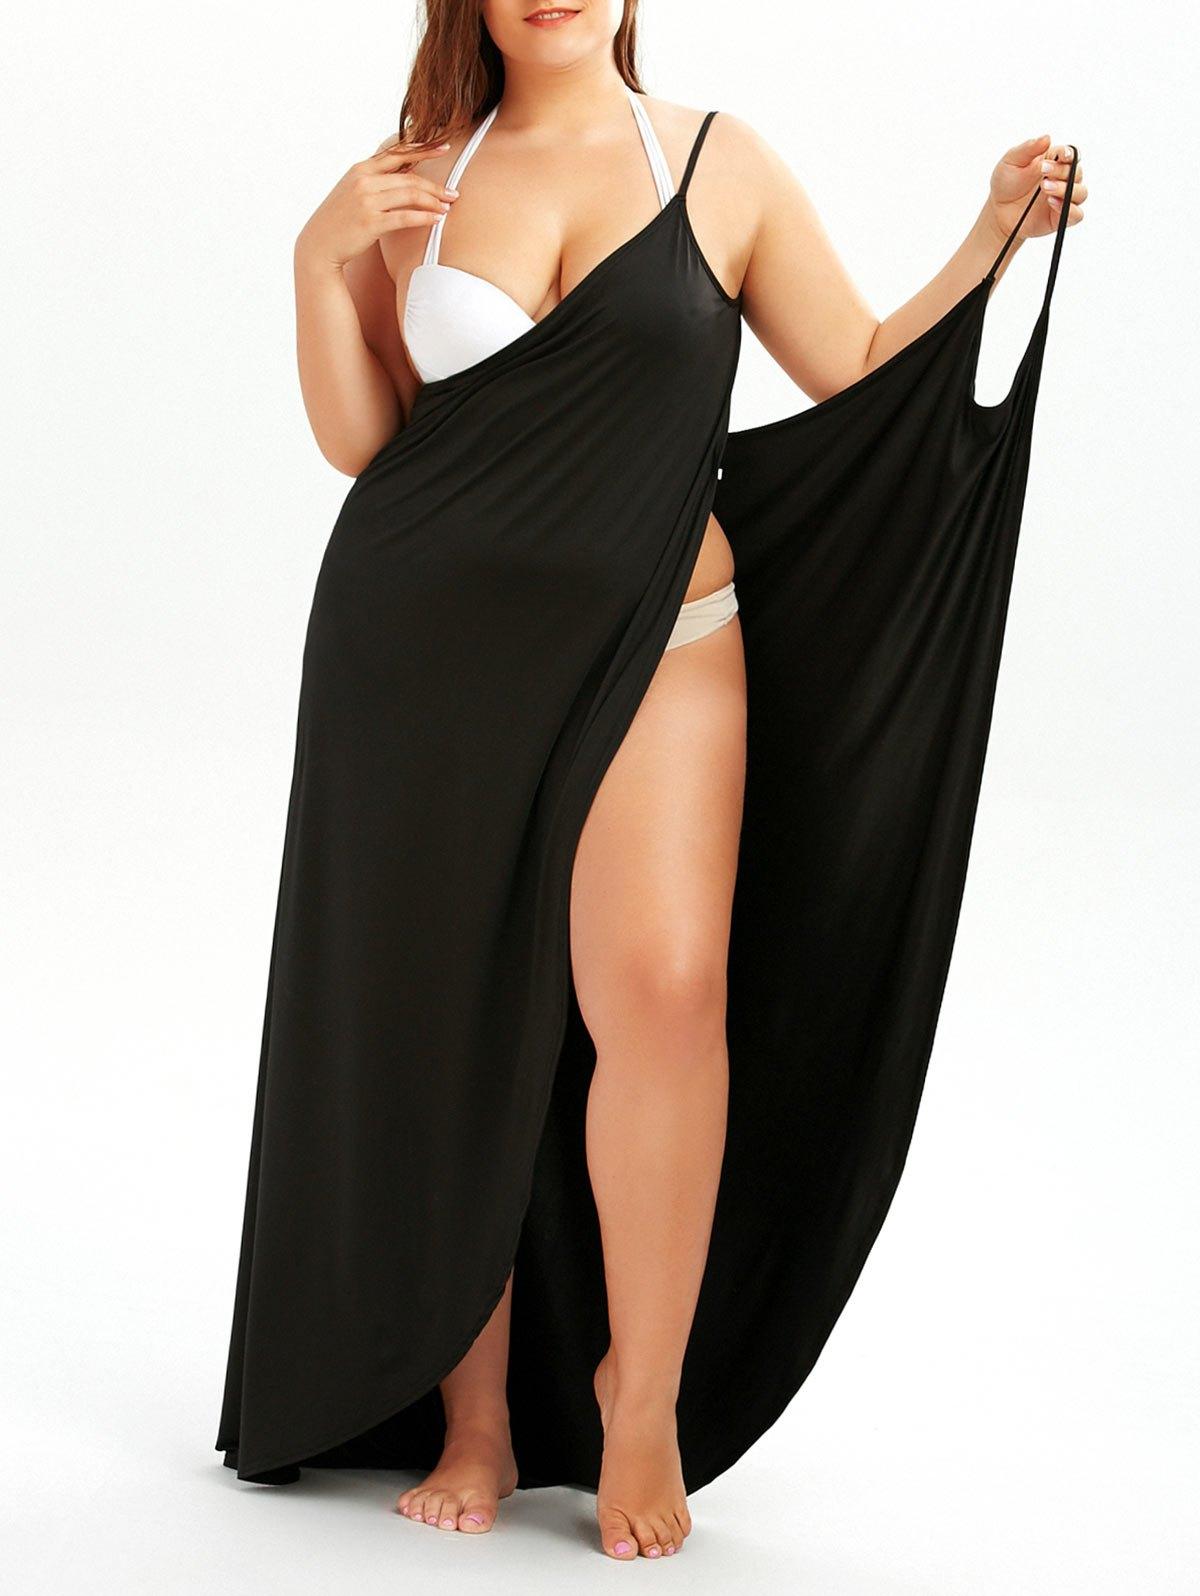 plus size dress ... plus size beach wrap cover up dress - black 5xl ... TCNUFVK